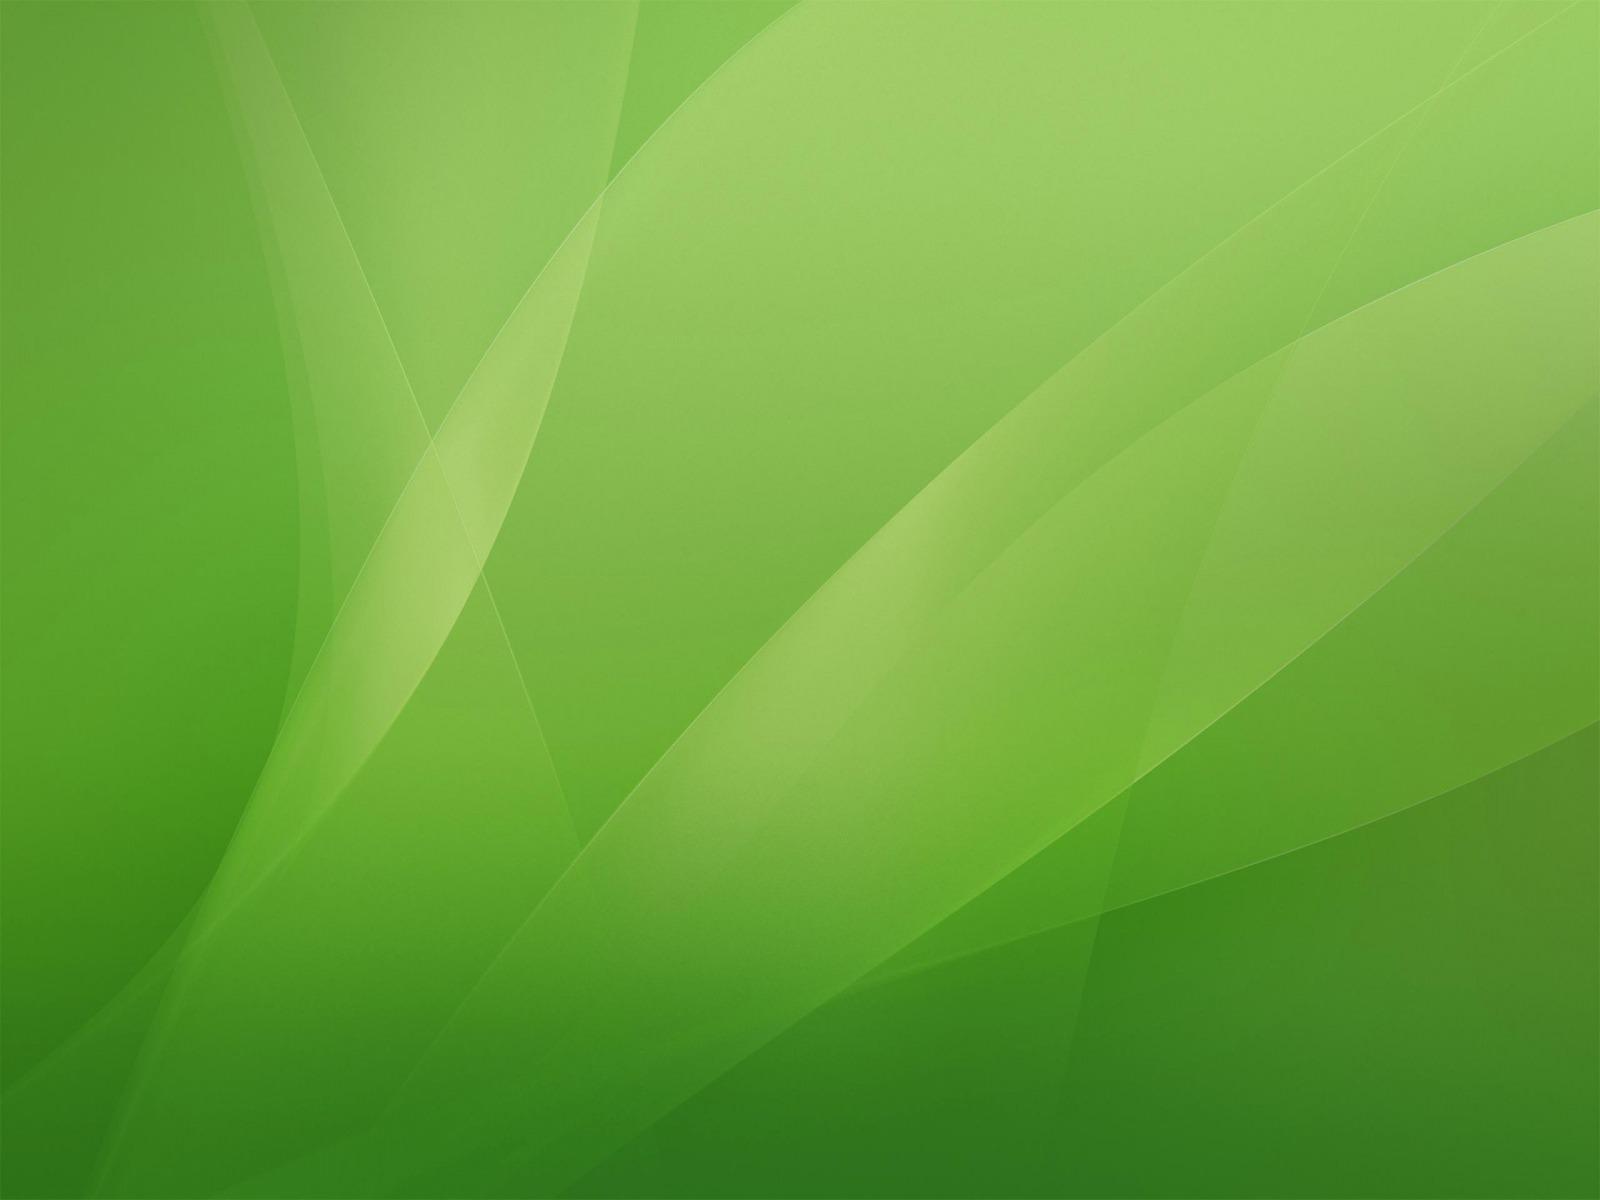 Light green wallpaper wallpapersafari for Green wallpaper